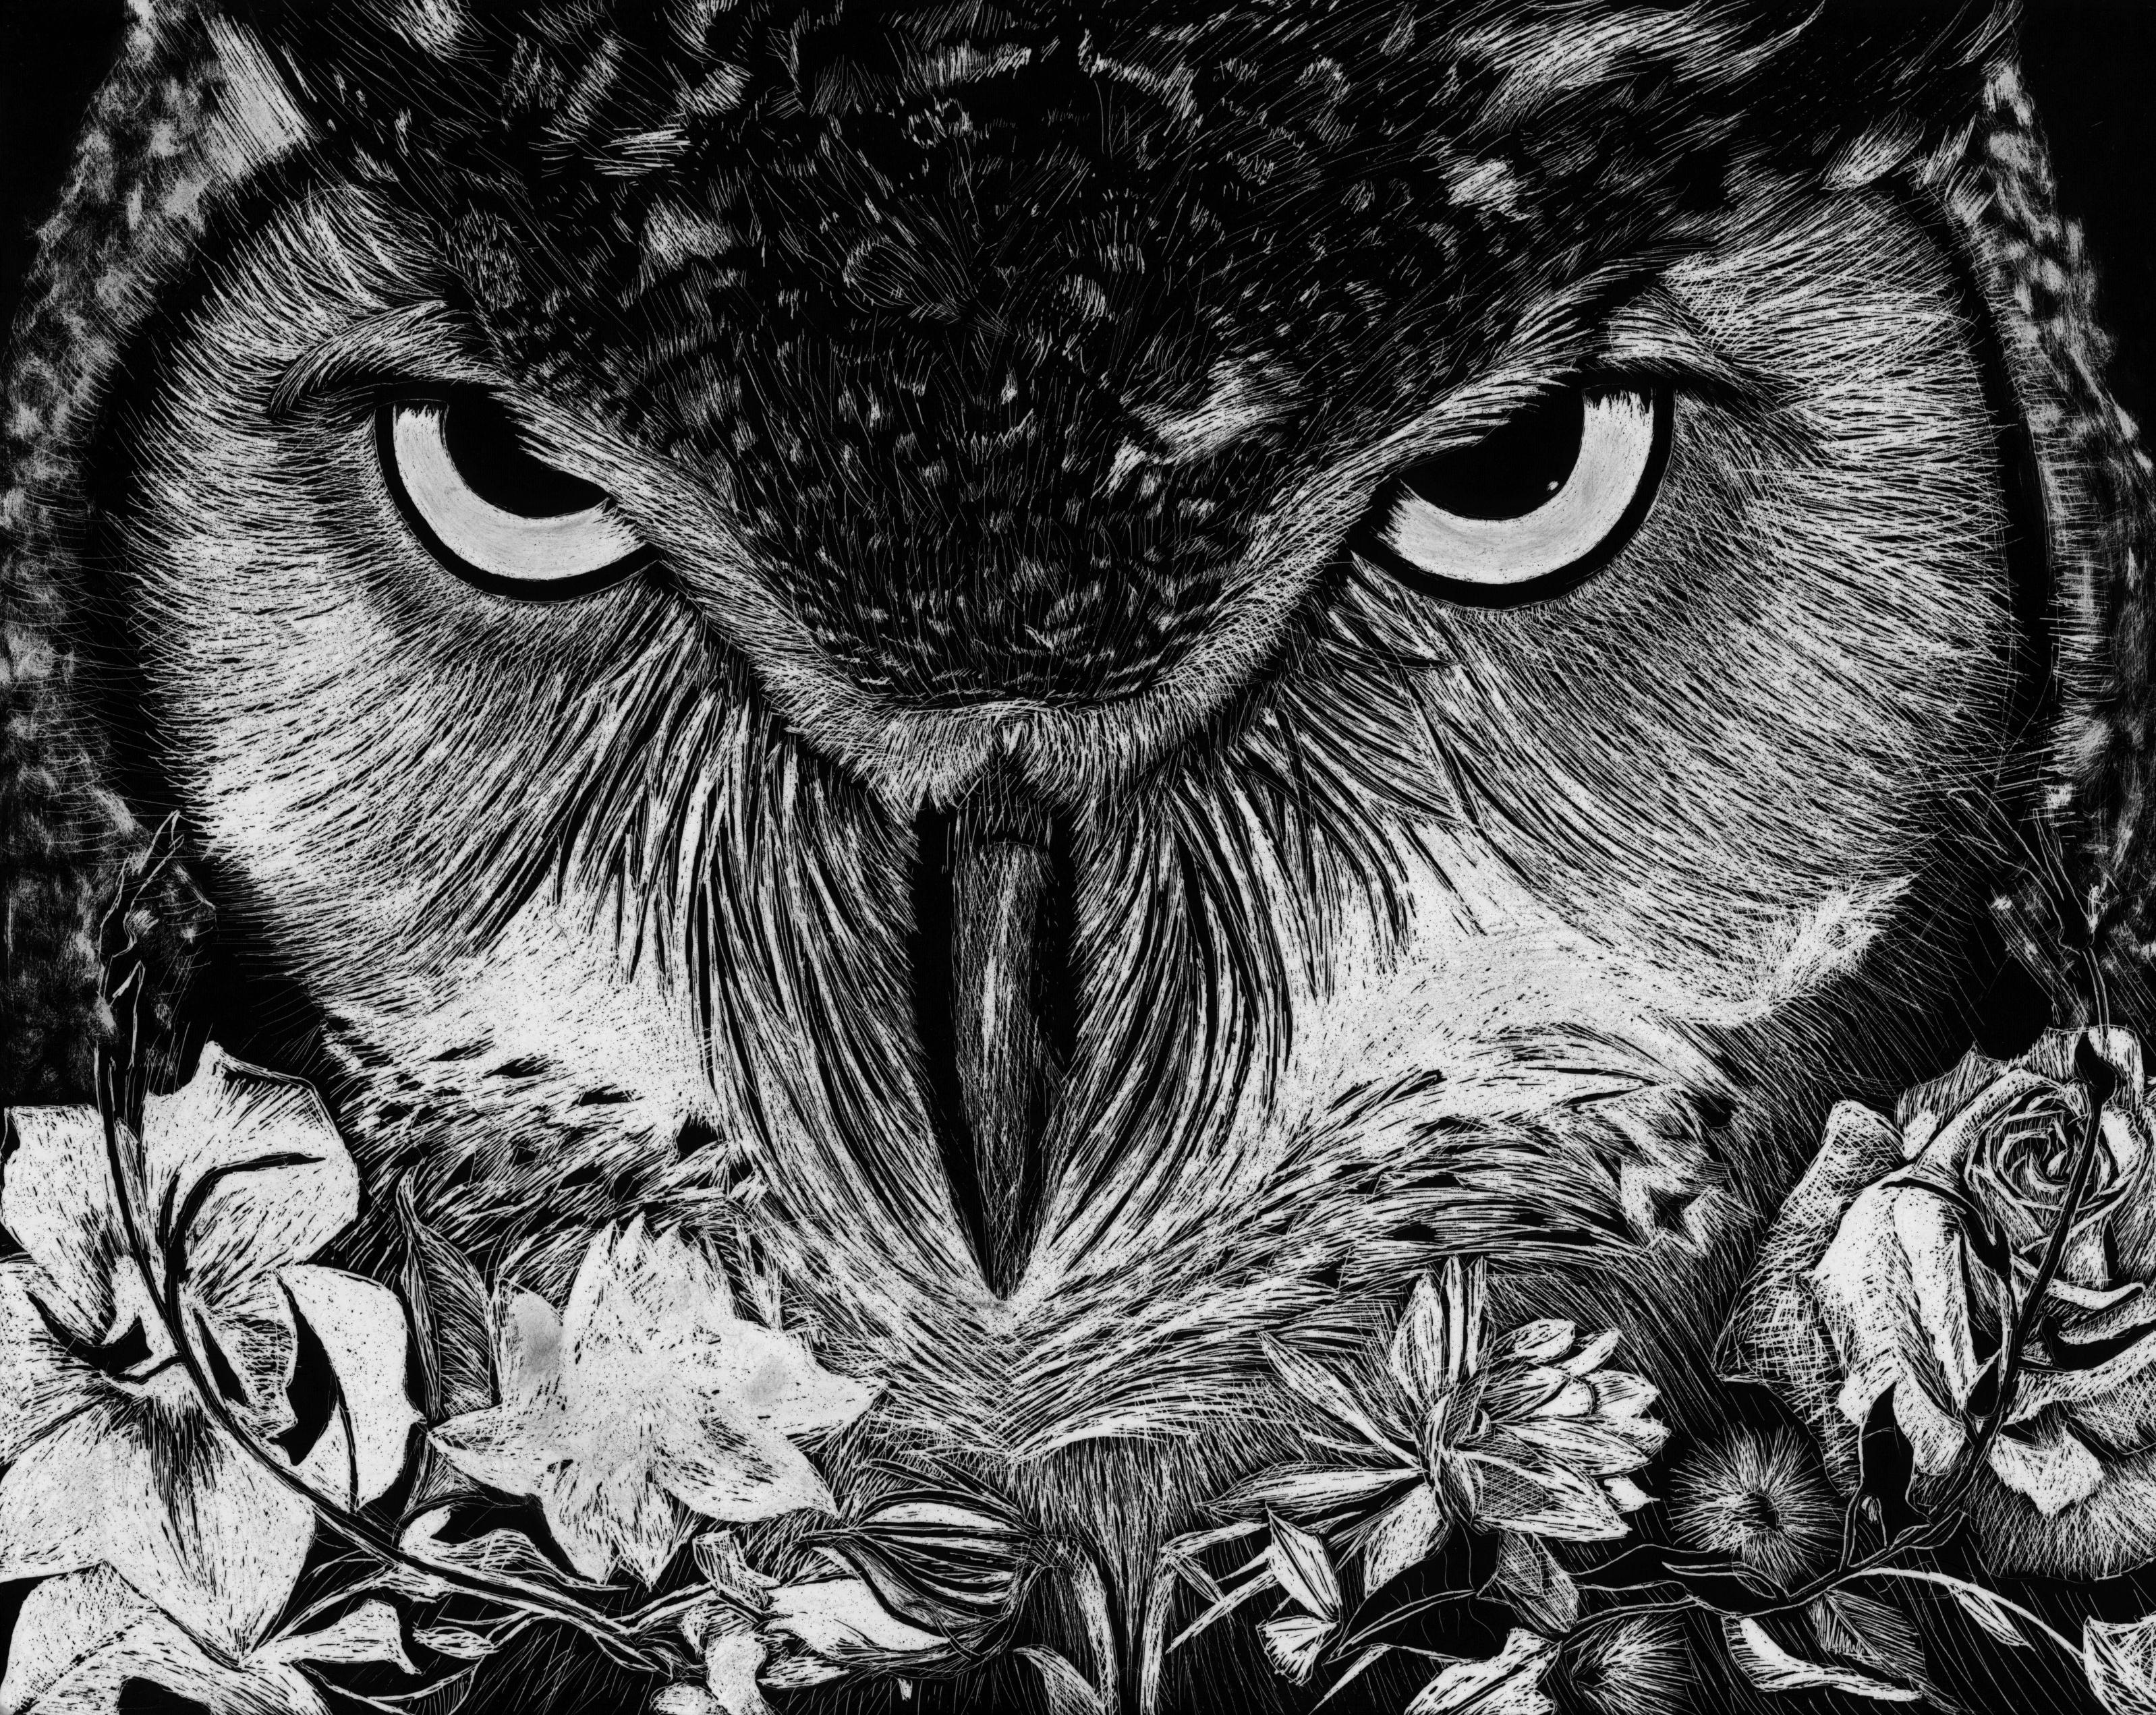 NIght Owl, 2012